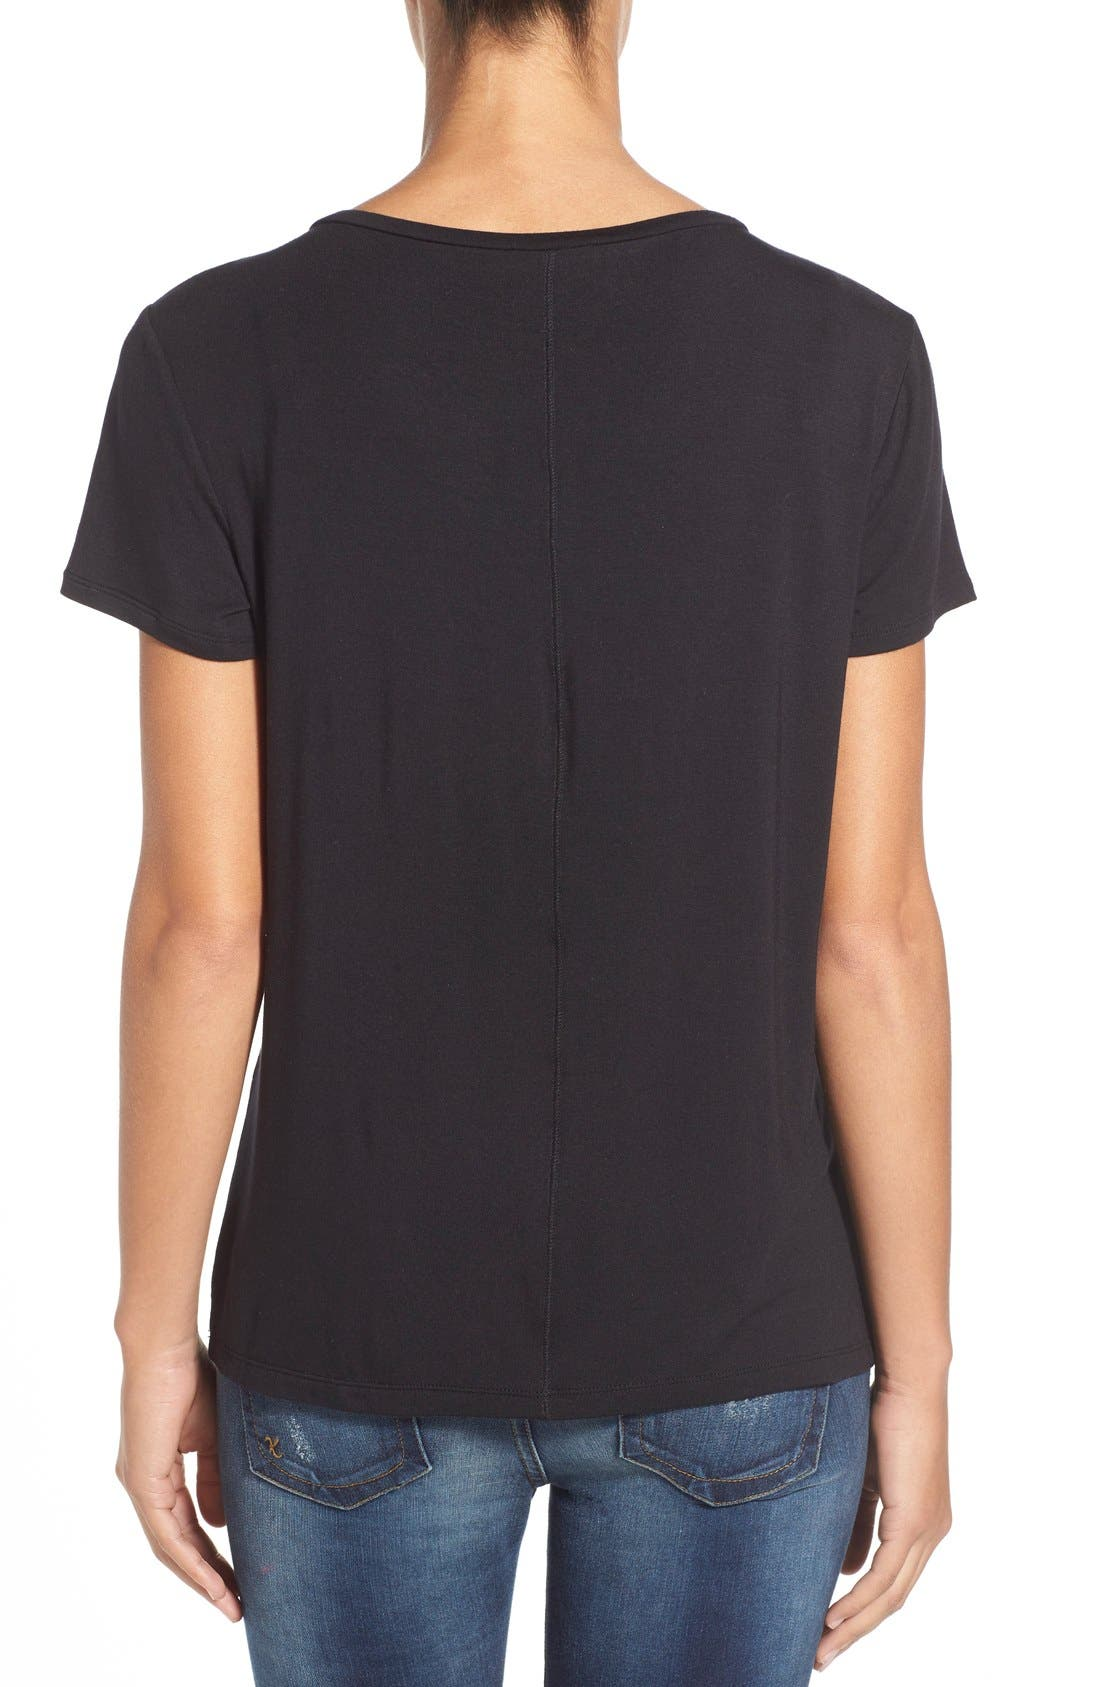 cb55a978b Women's Short Sleeve Tops | Nordstrom